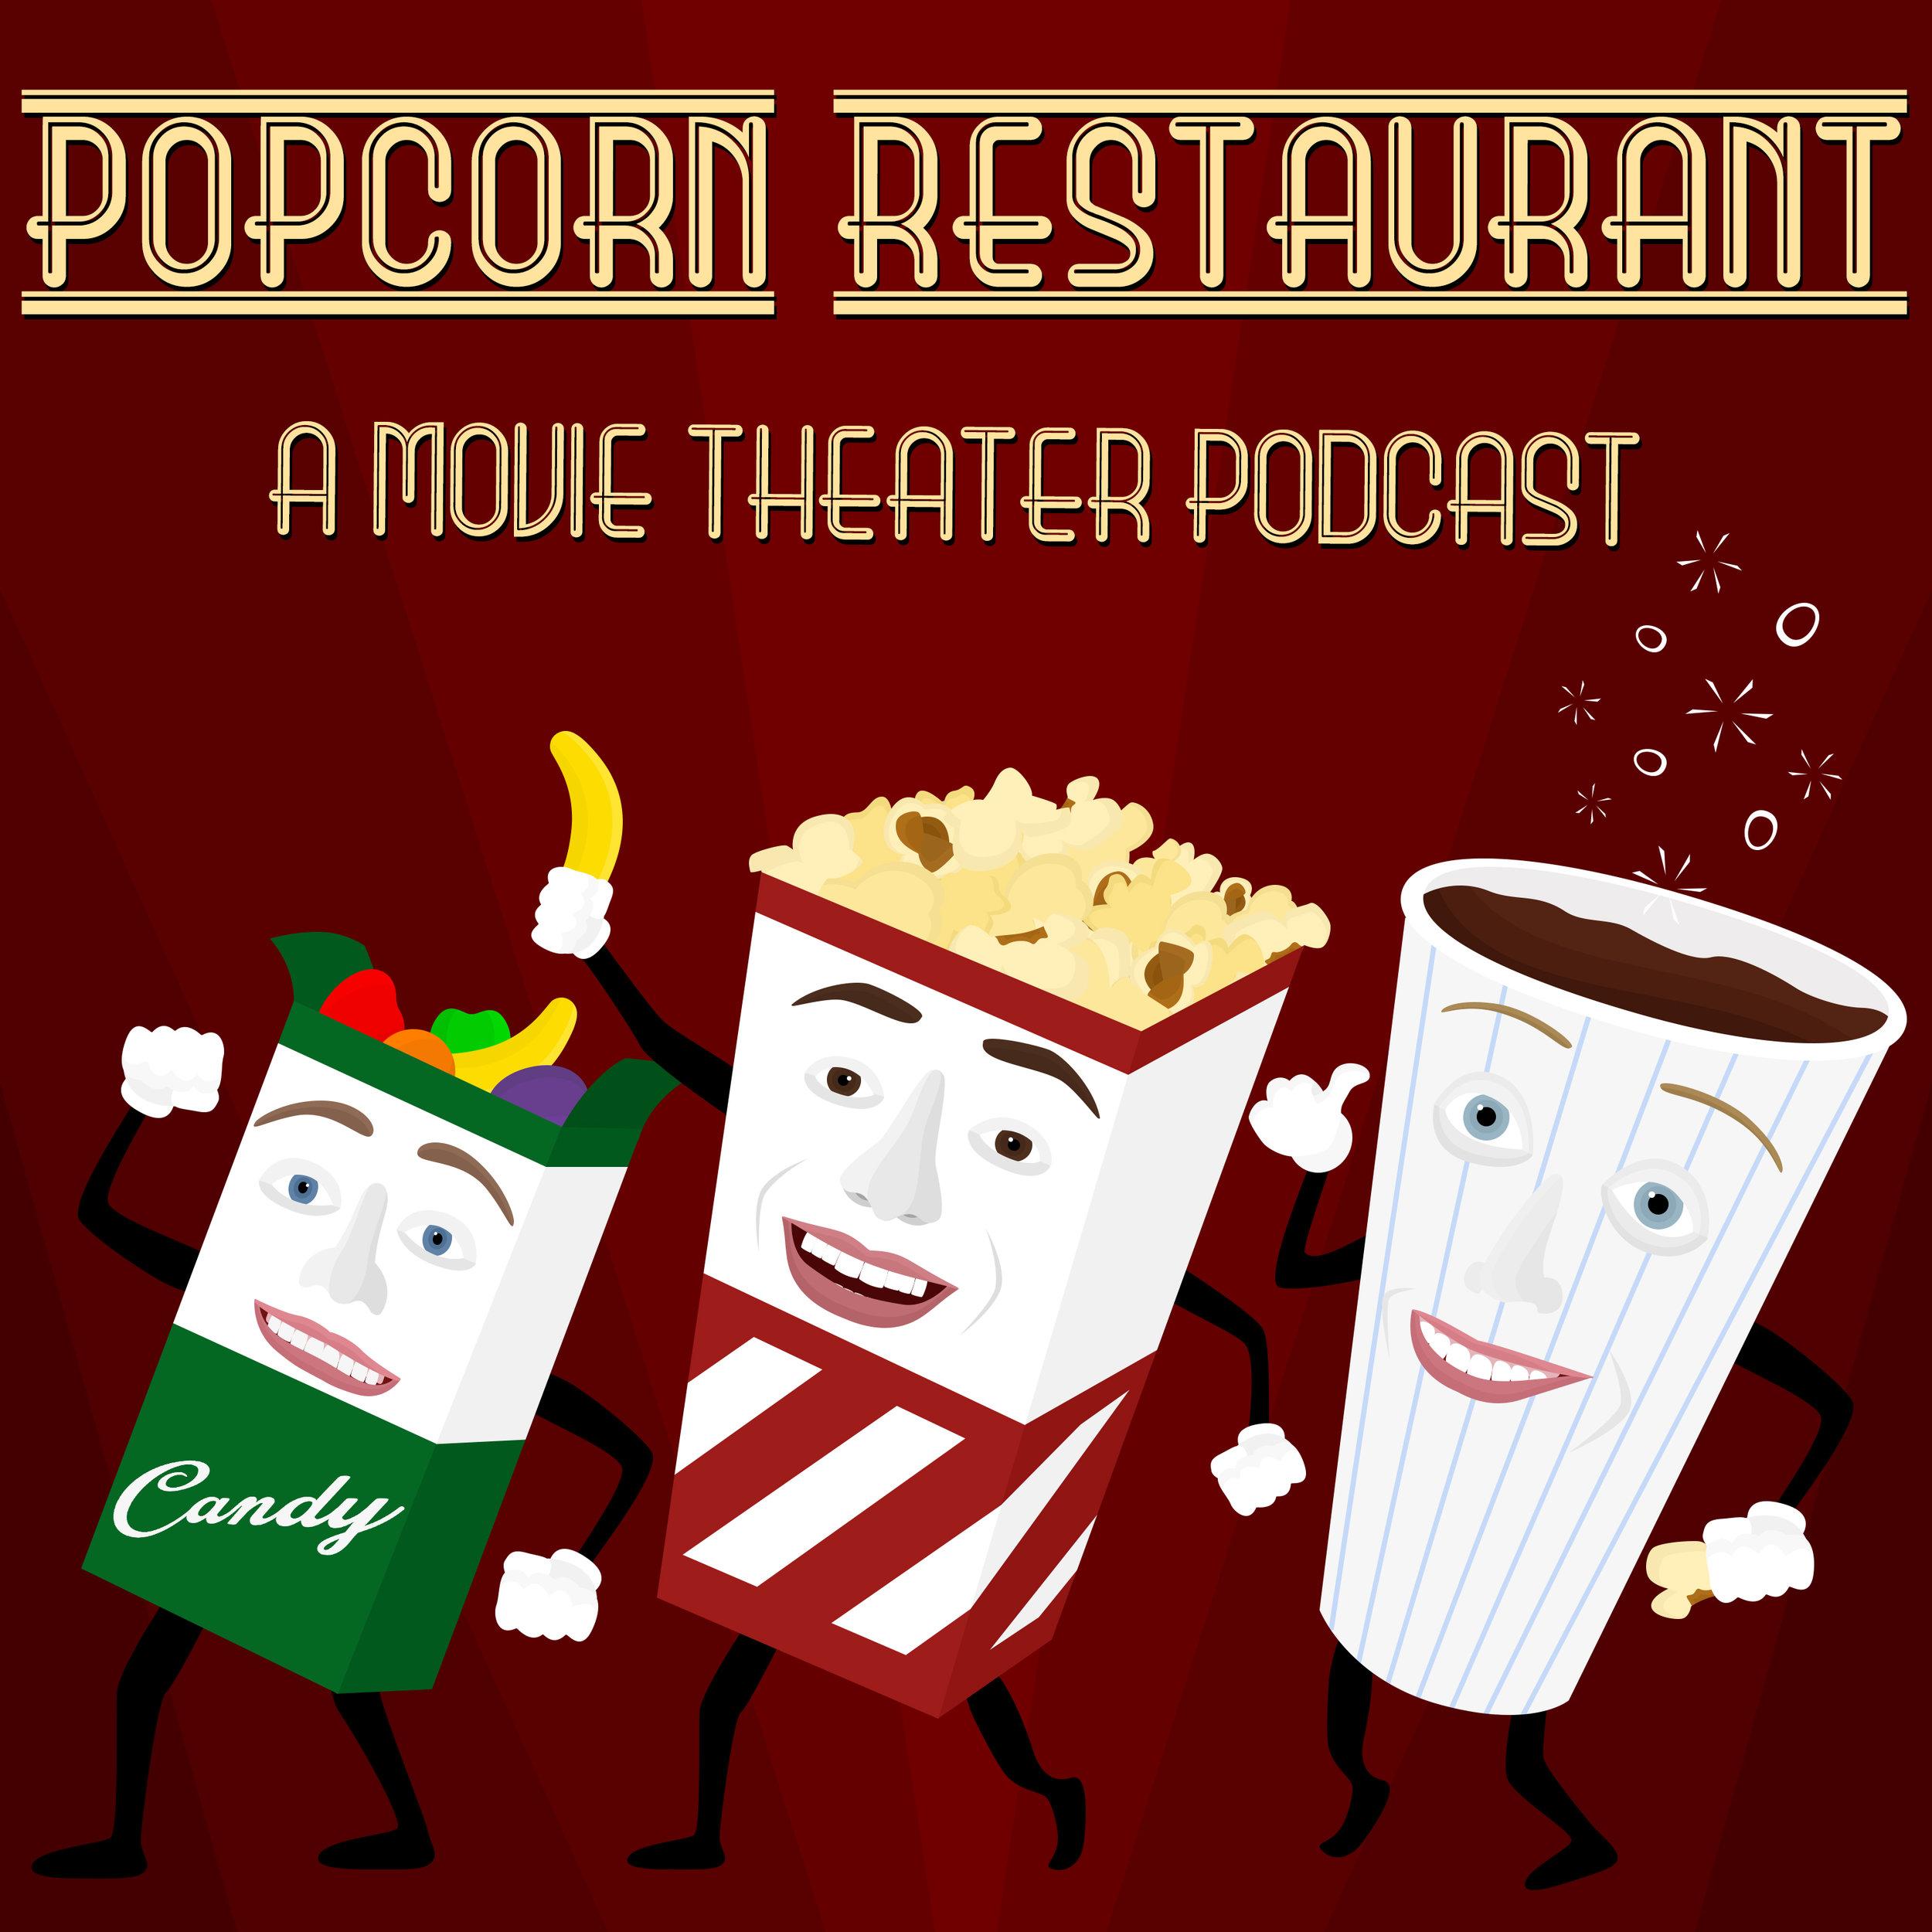 Popcorn Restaurant A Movie Theater Podcast